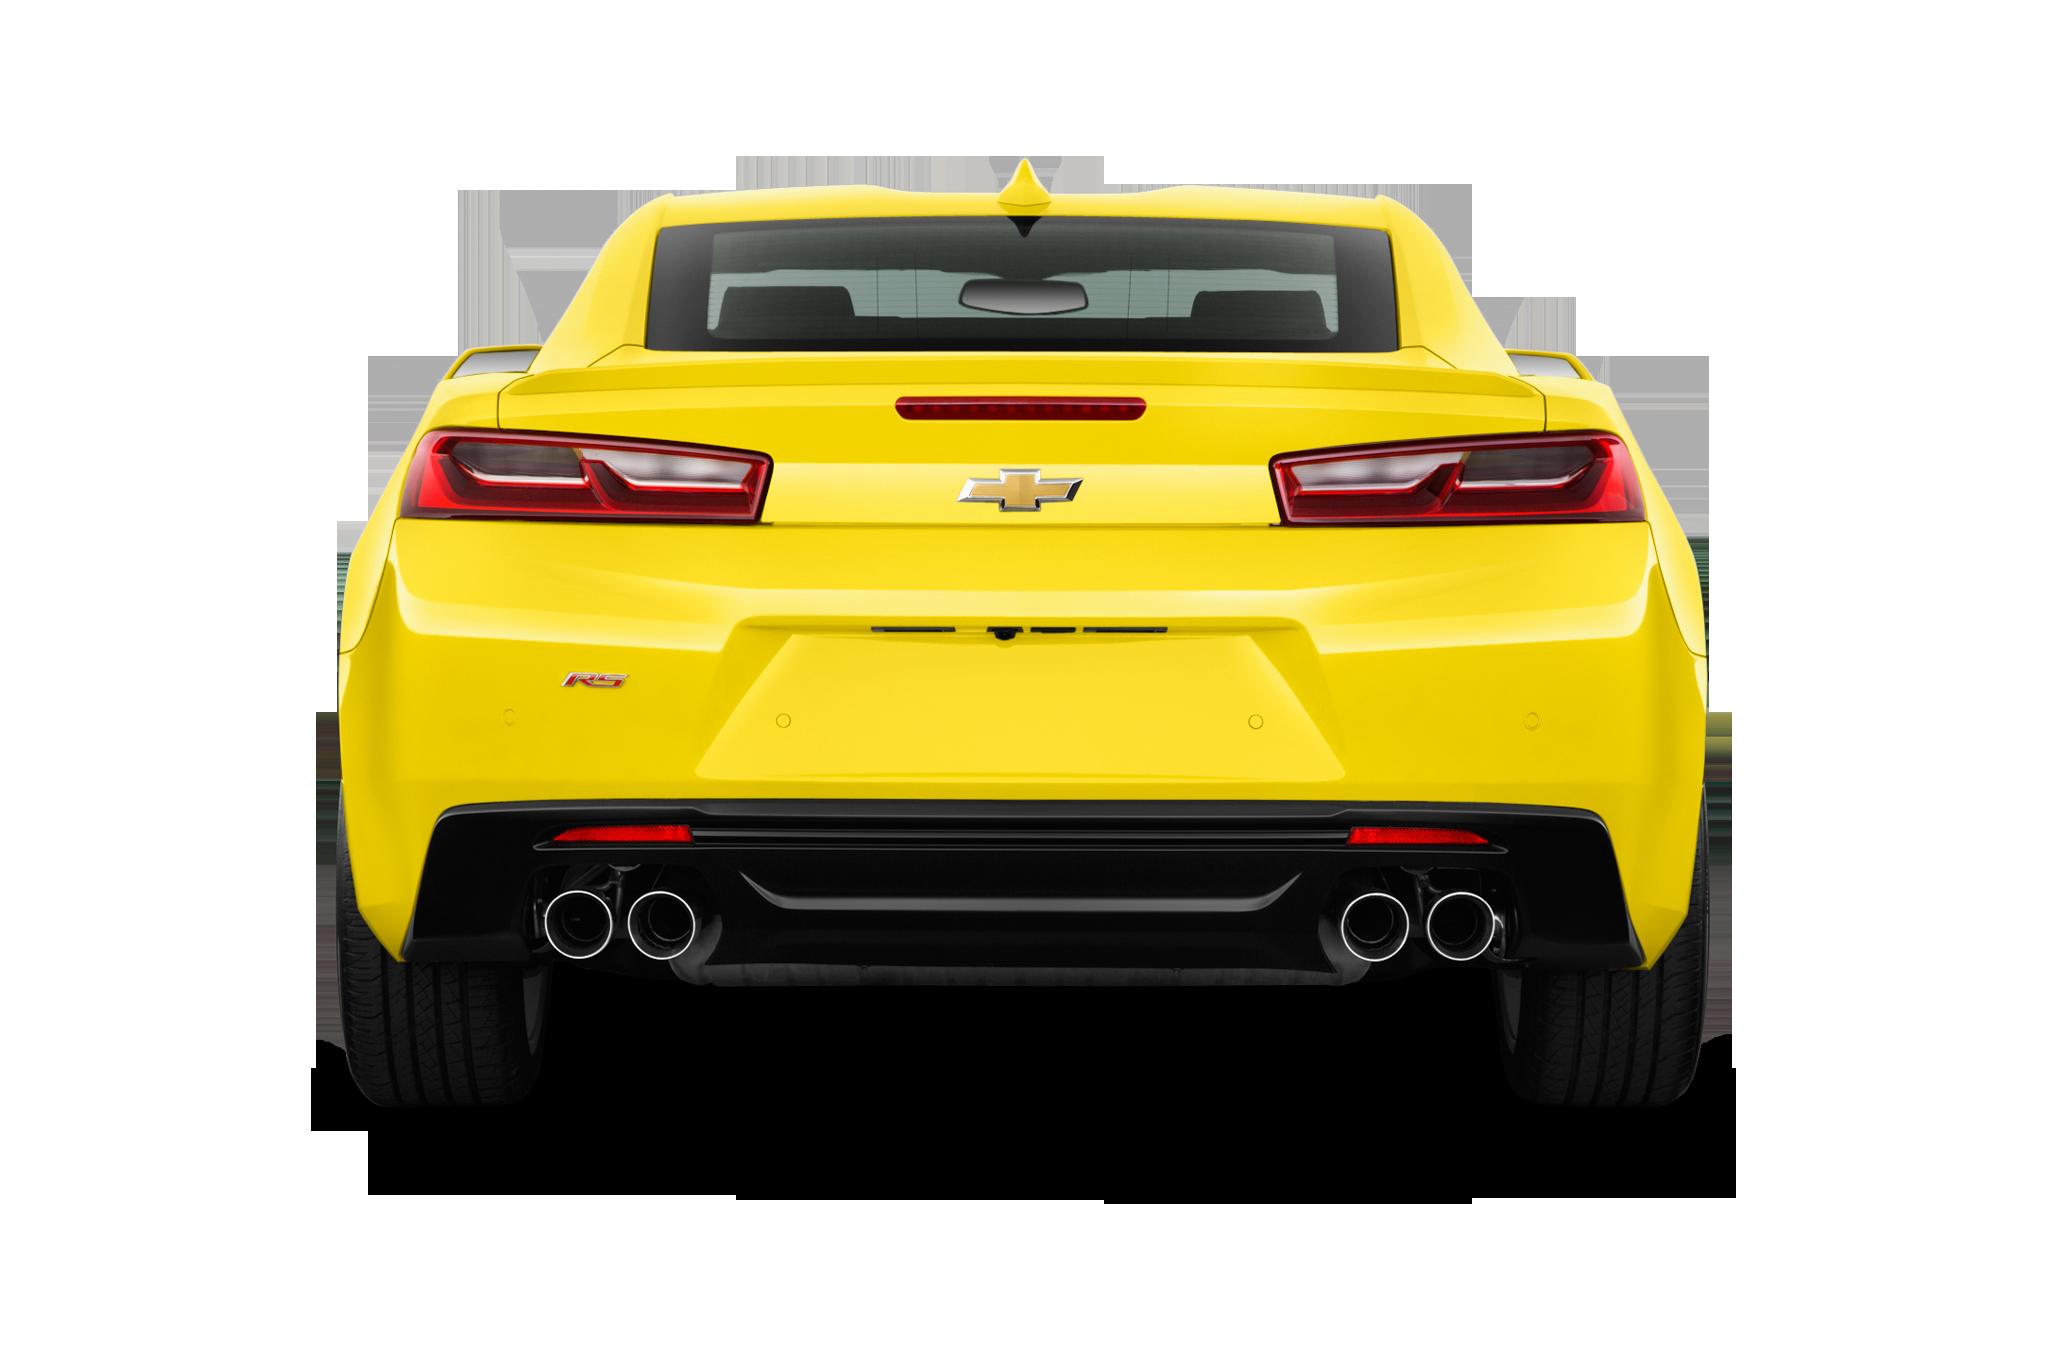 Clipart car tavera. Chevrolet cars png images